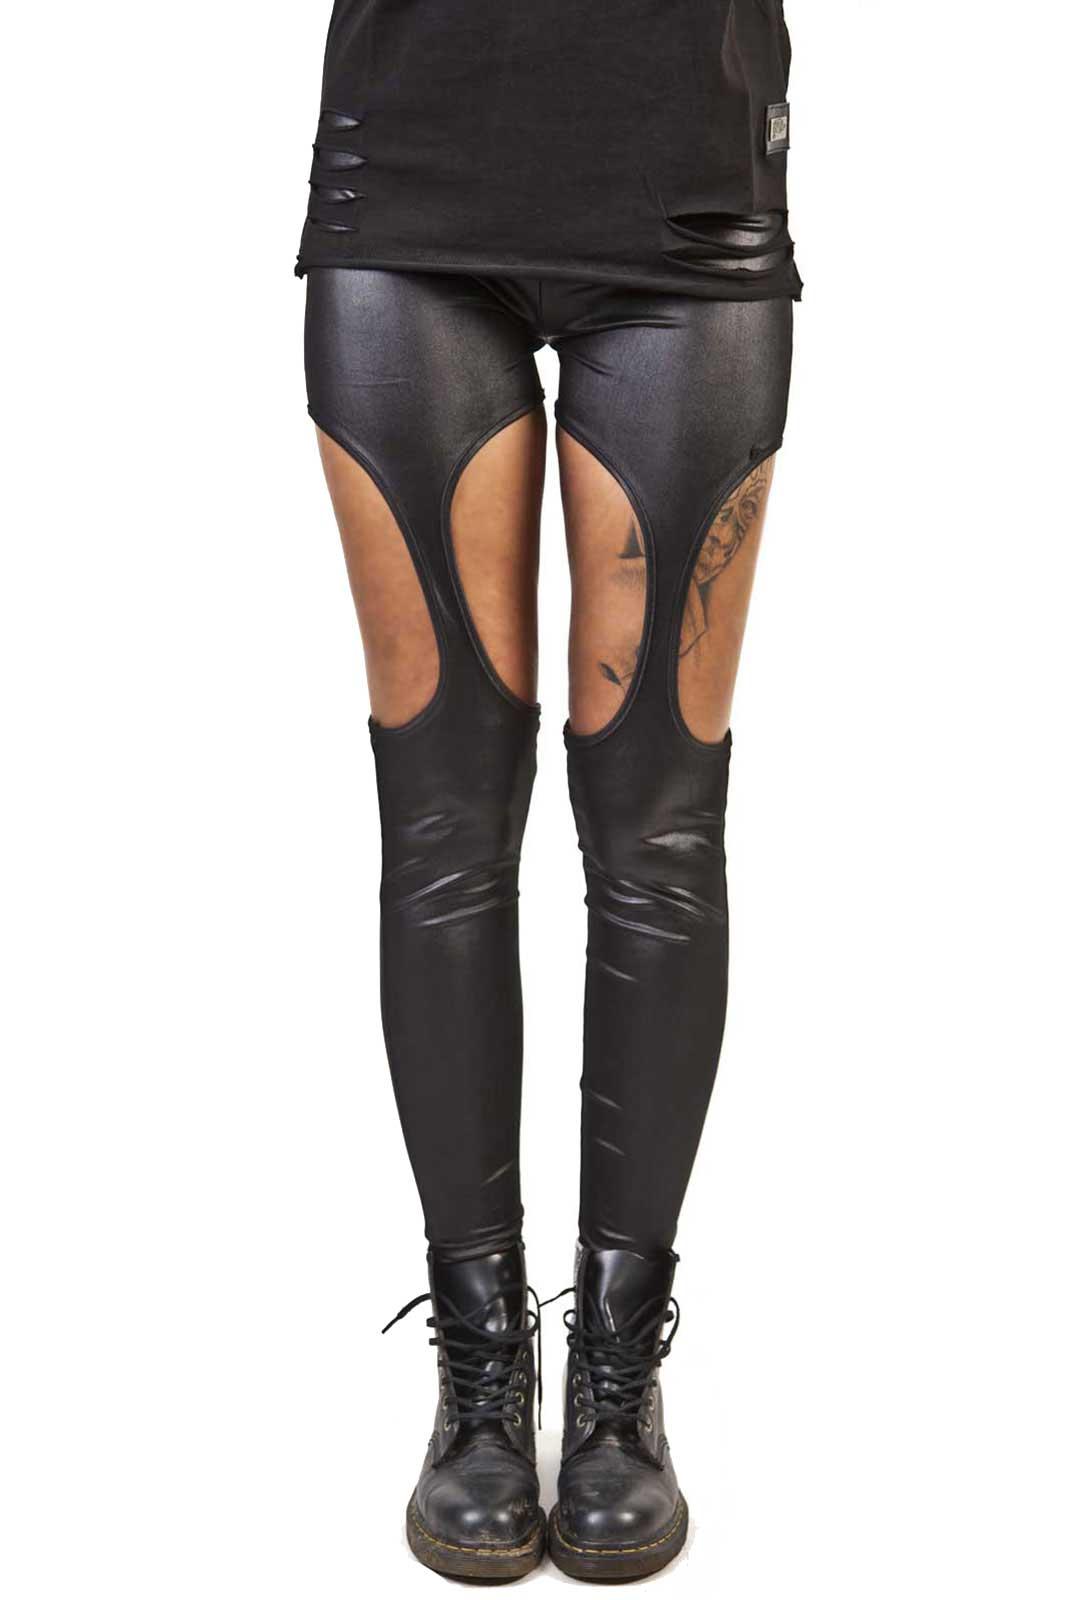 poizen industries cutout leggings